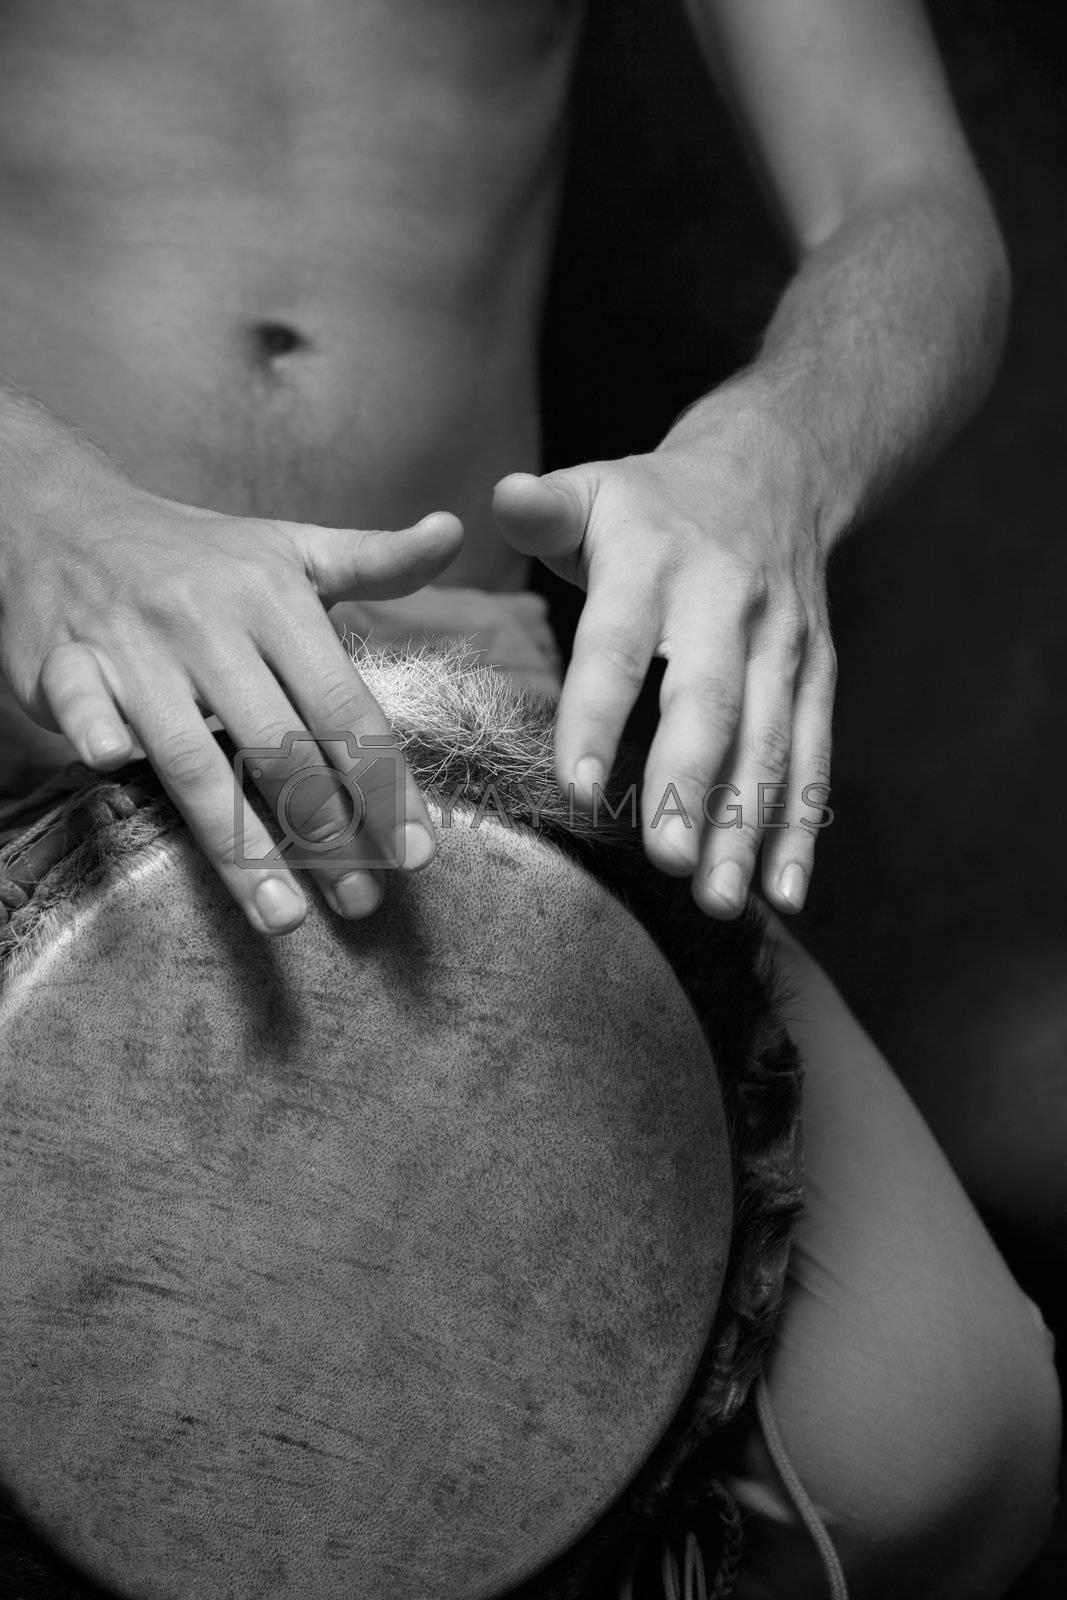 Man playing the djembe (nigerian drum) in studio